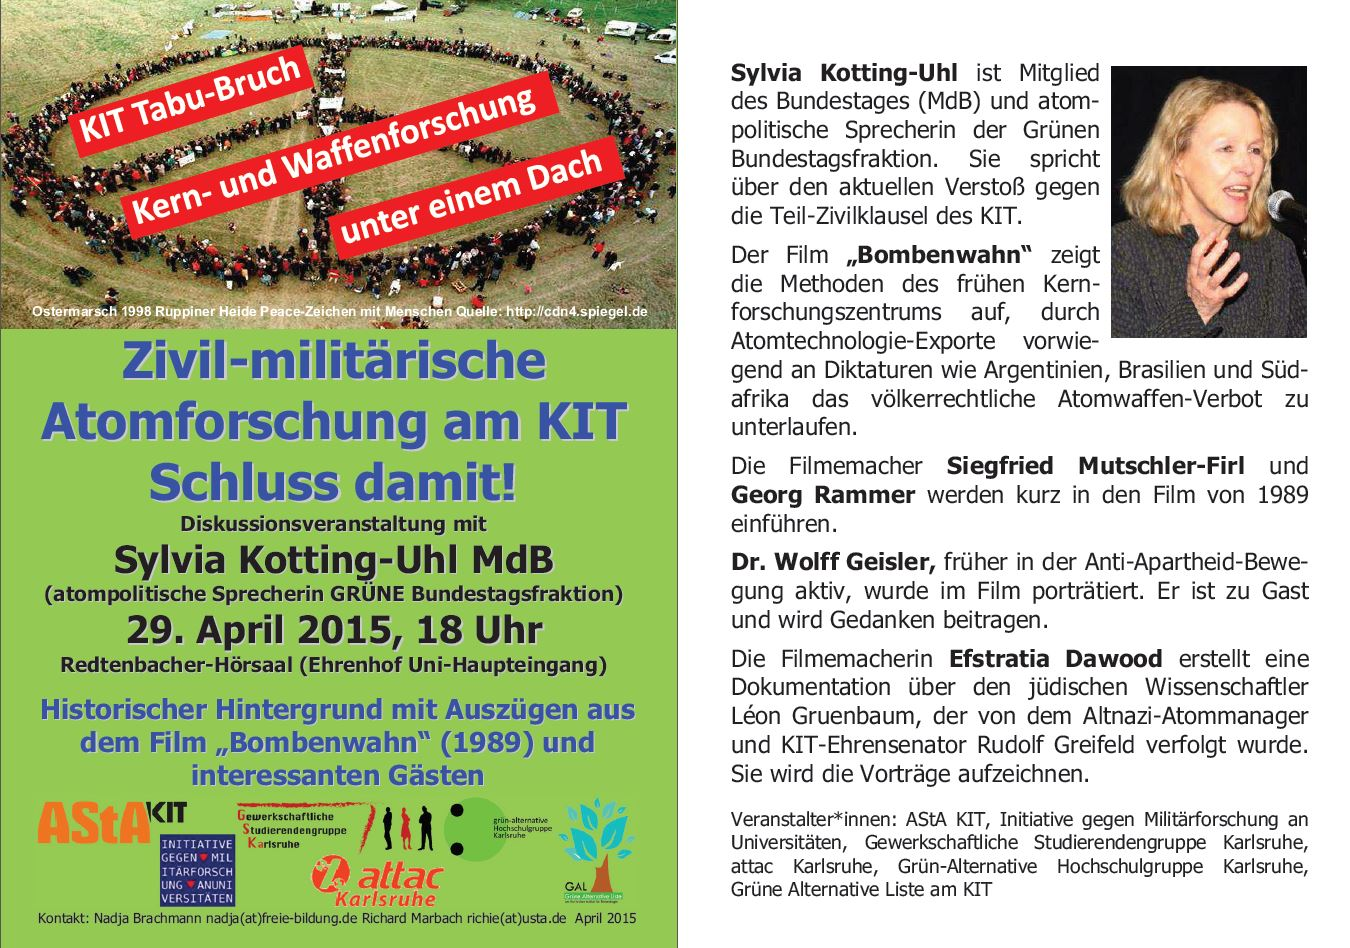 Zivil-militärische Atomforschung am KIT